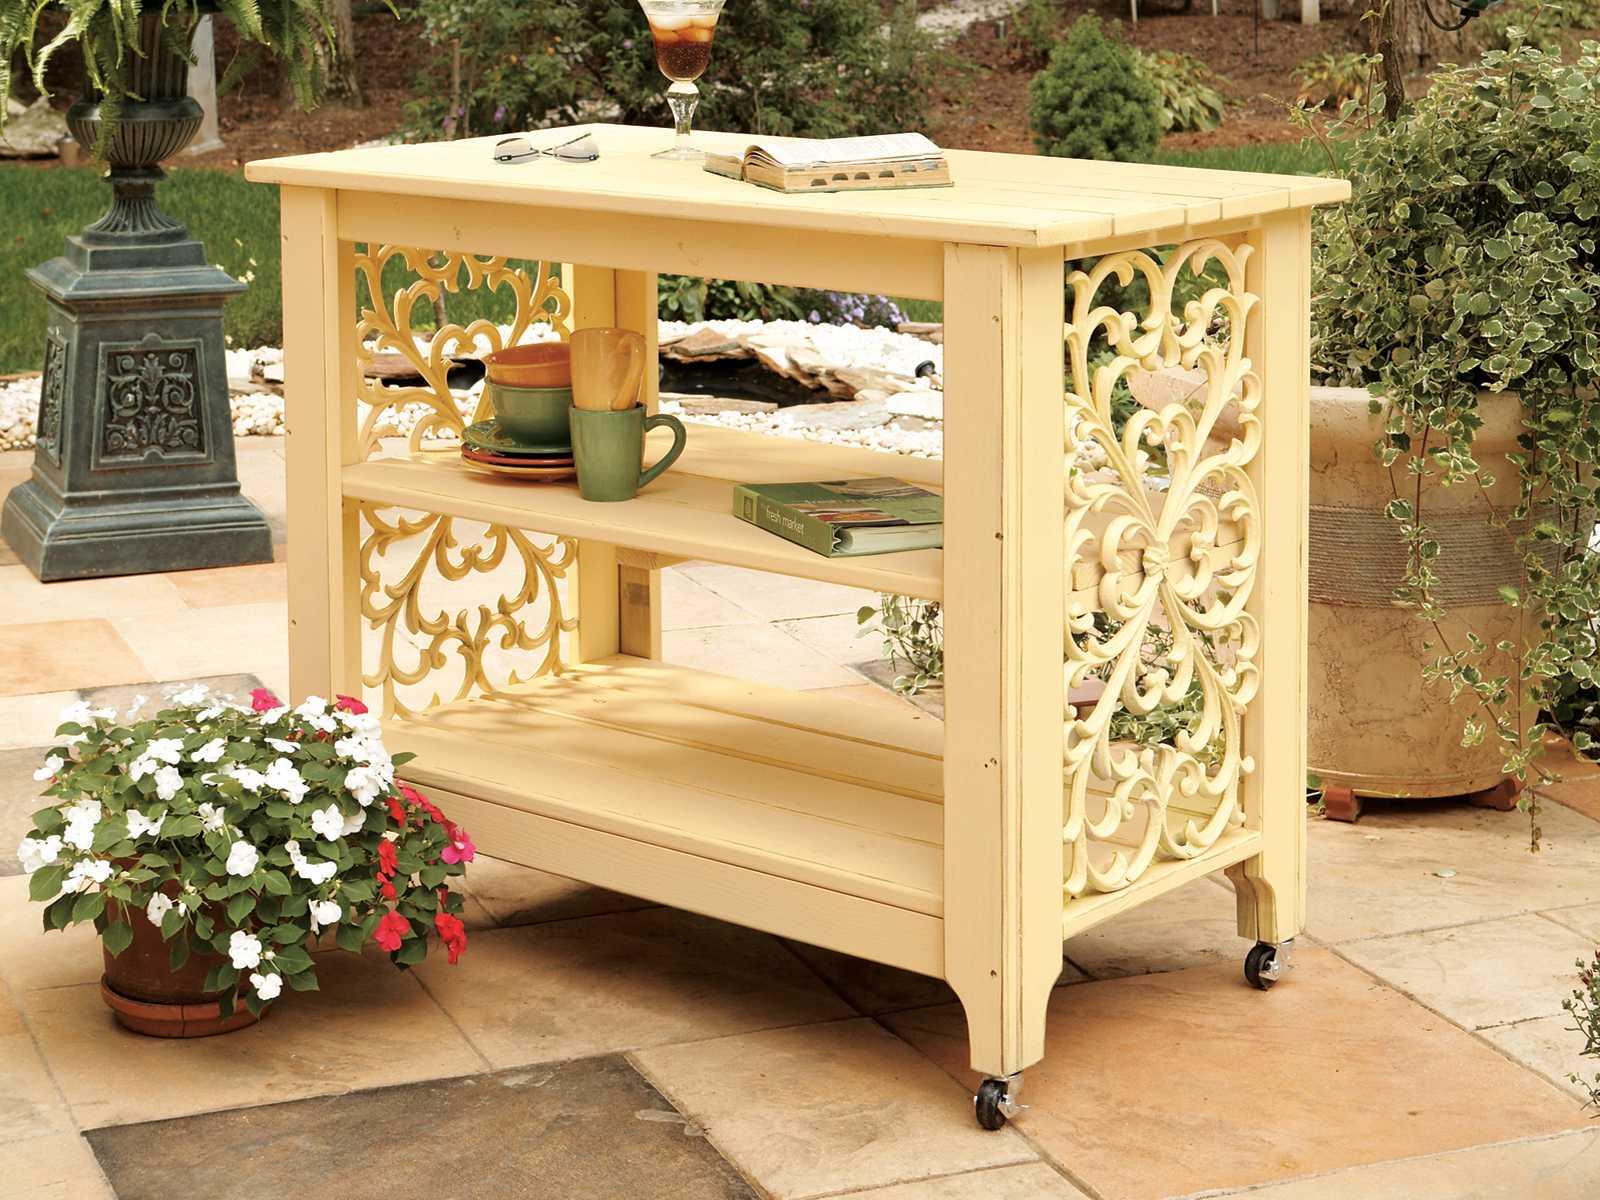 Wooden Patio Serving Carts ~ Uwharrie chair veranda wood serving cart uwv